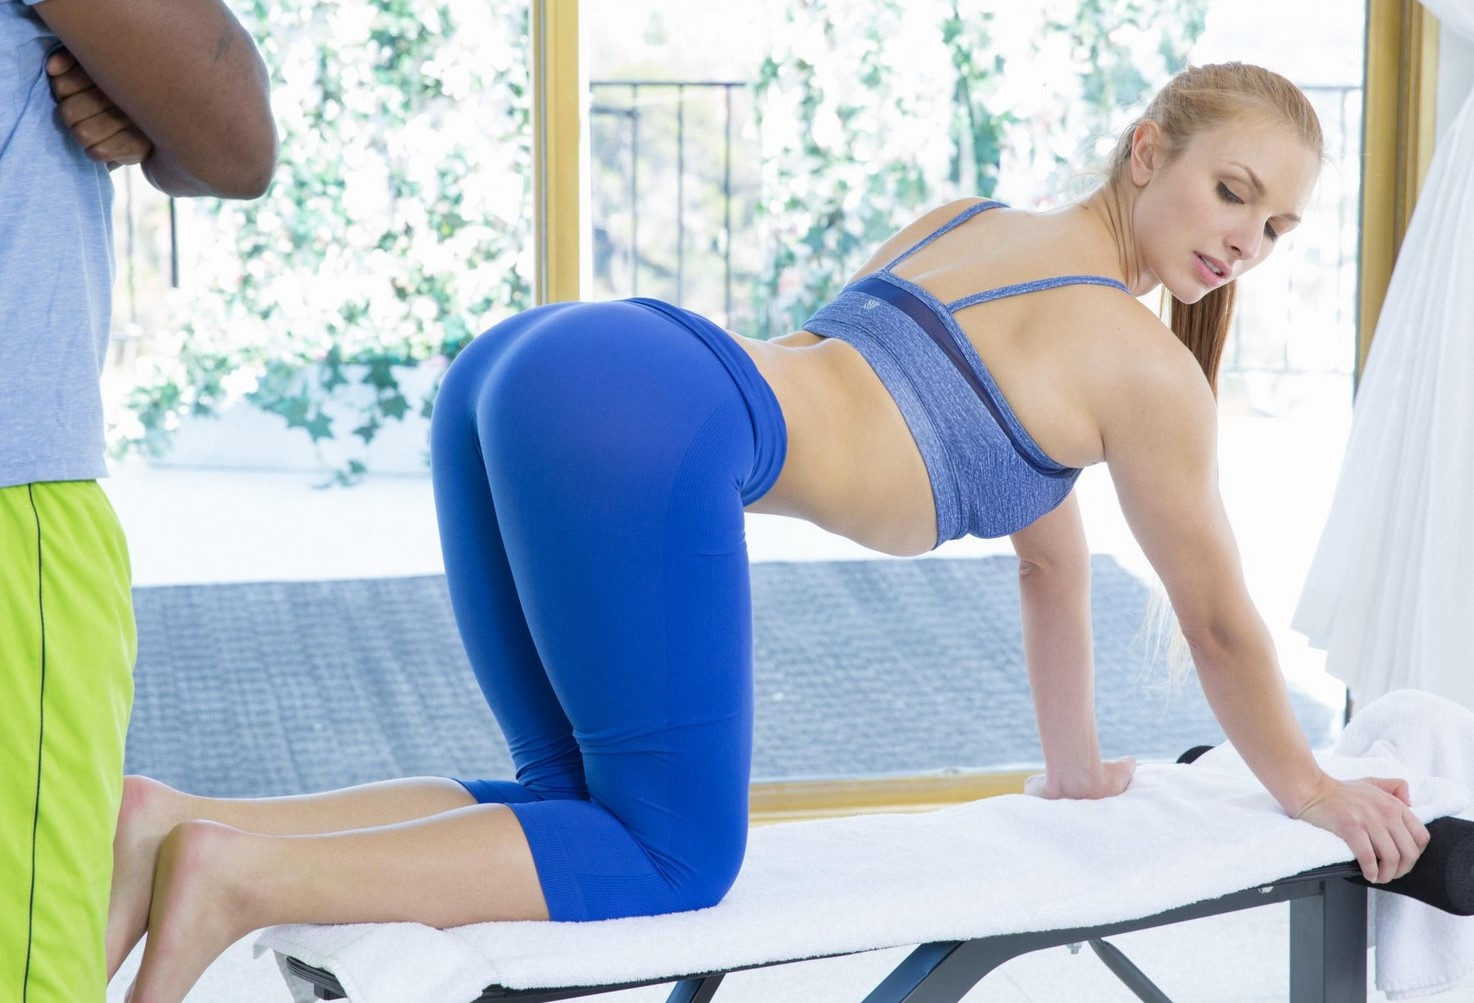 Layna Landry - chupar y follar en el gym (interracial)